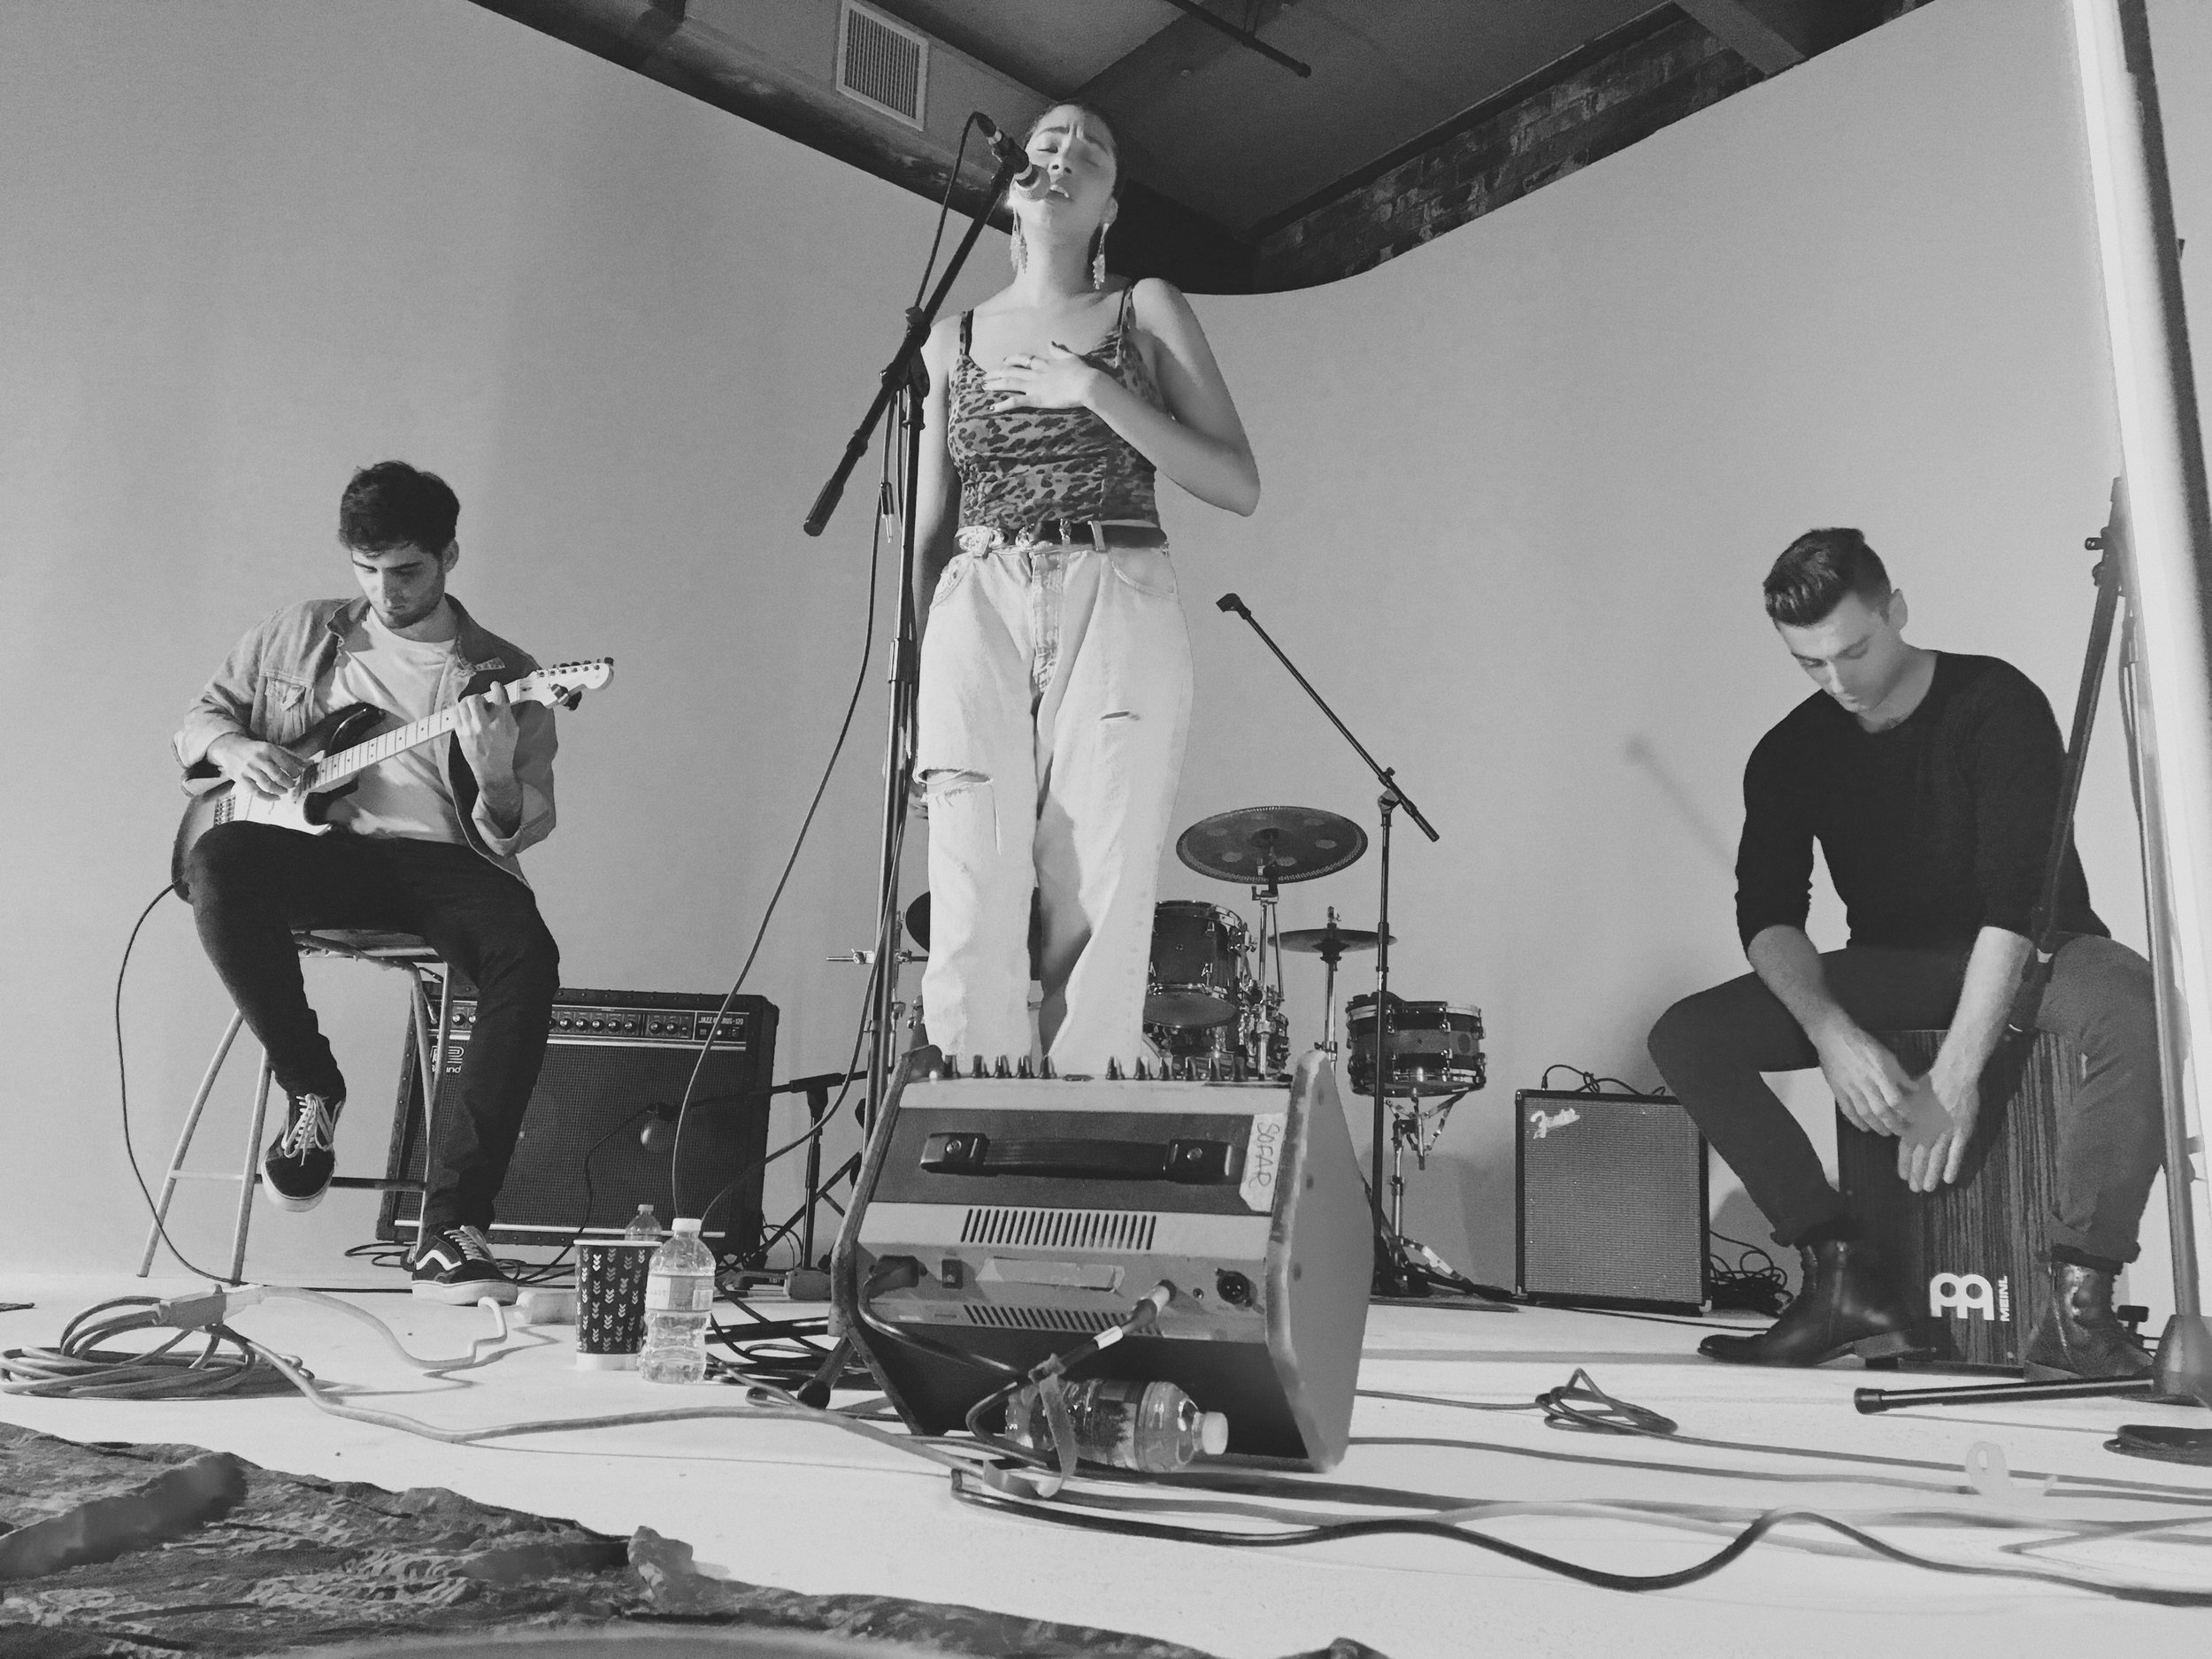 1/17/19  SOFAR SOUNDS LA  ReKon Studios, Culver City, United States